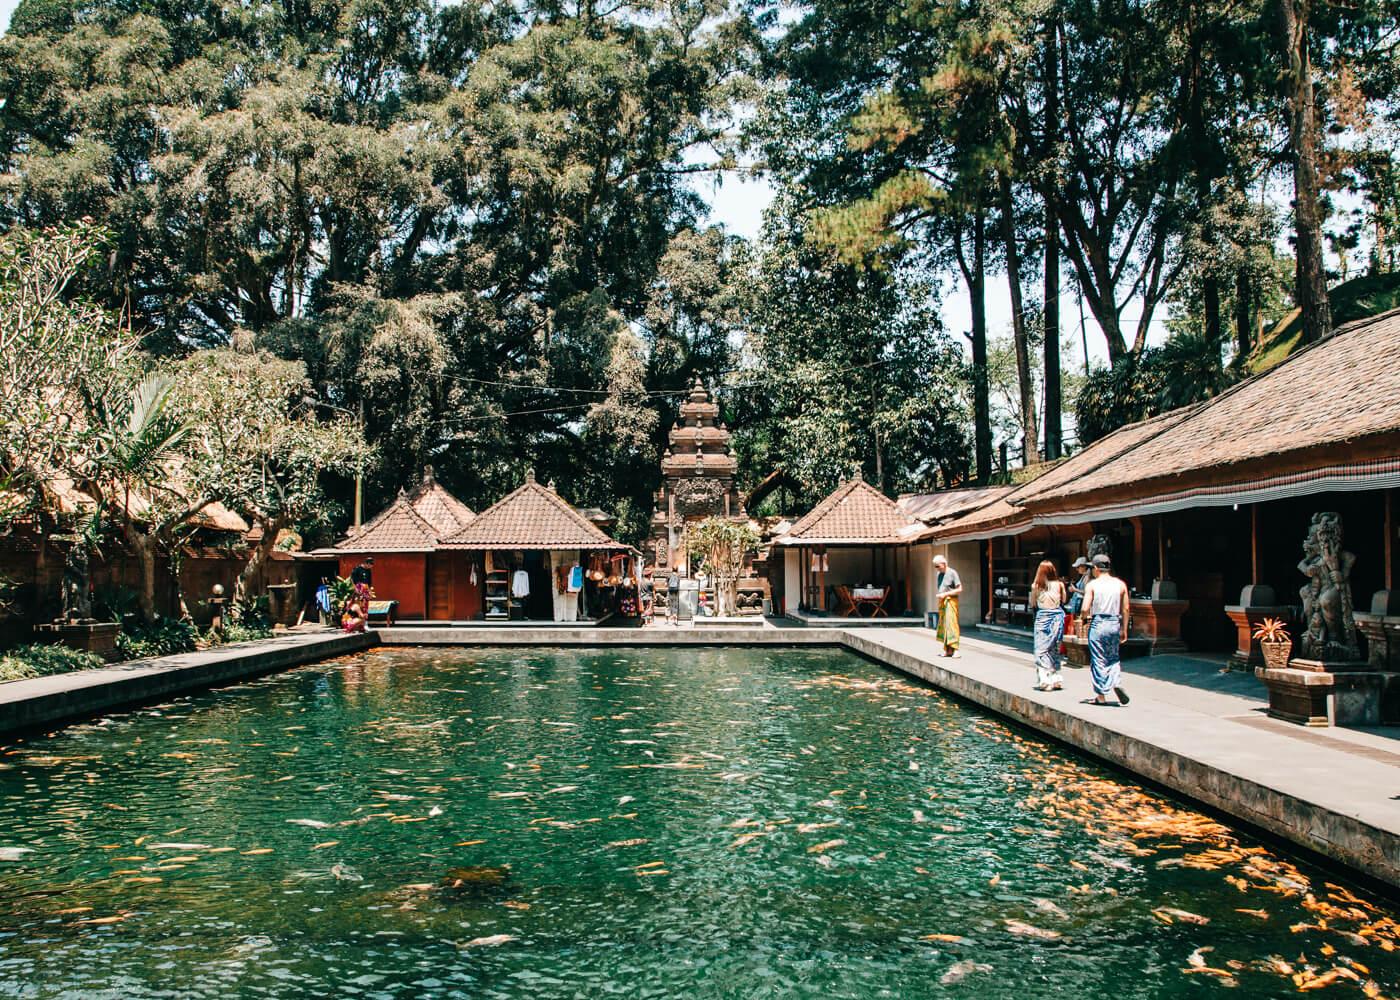 Templo Tirta Empul - Ubud - Bali - Indonésia | Piscina com carpas